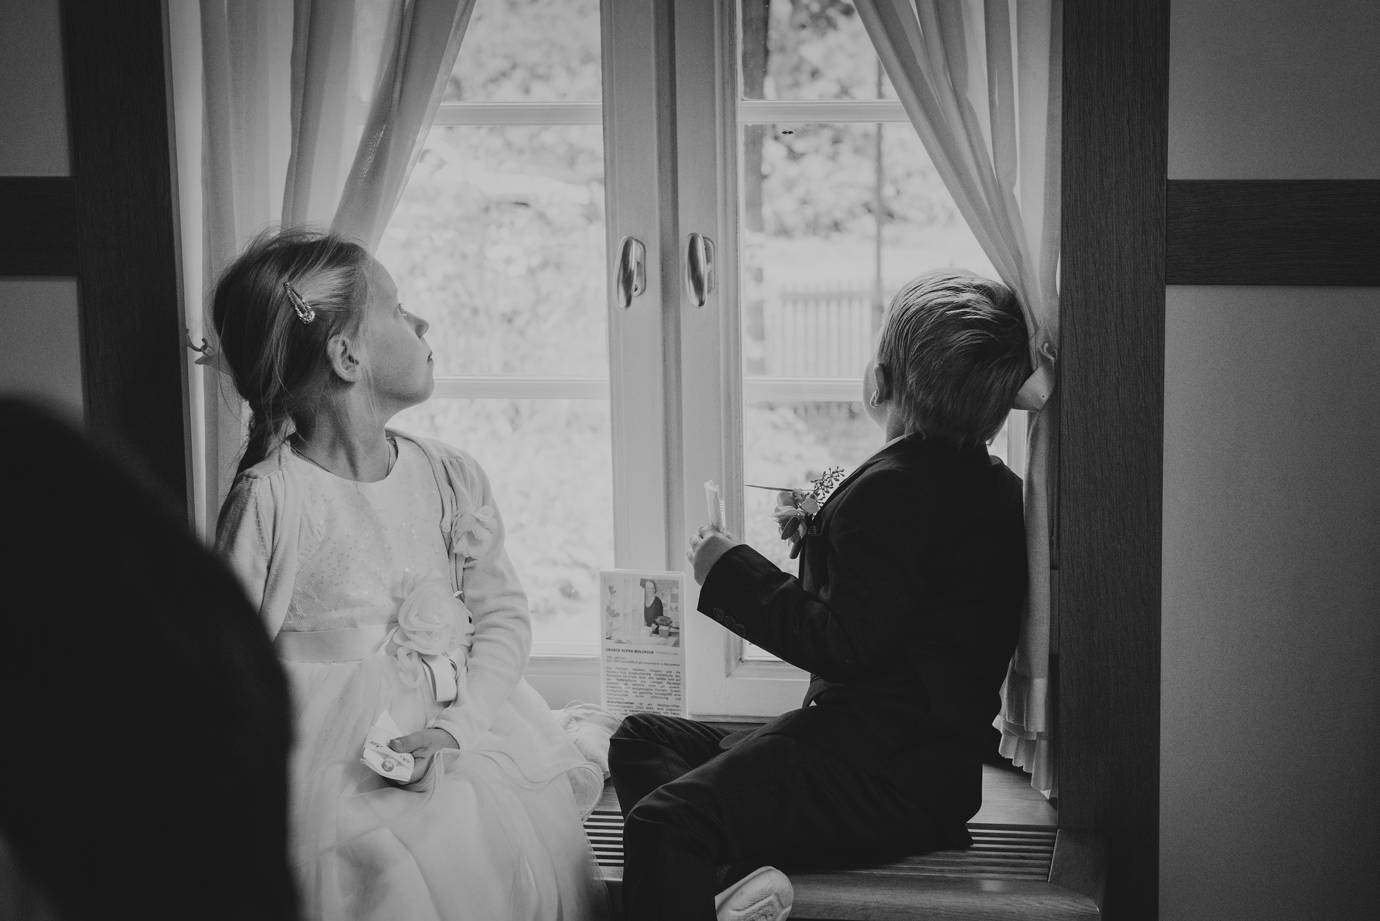 hochzeitsfotograf neu helgoland worpswede 044 - Marisa+Pascal